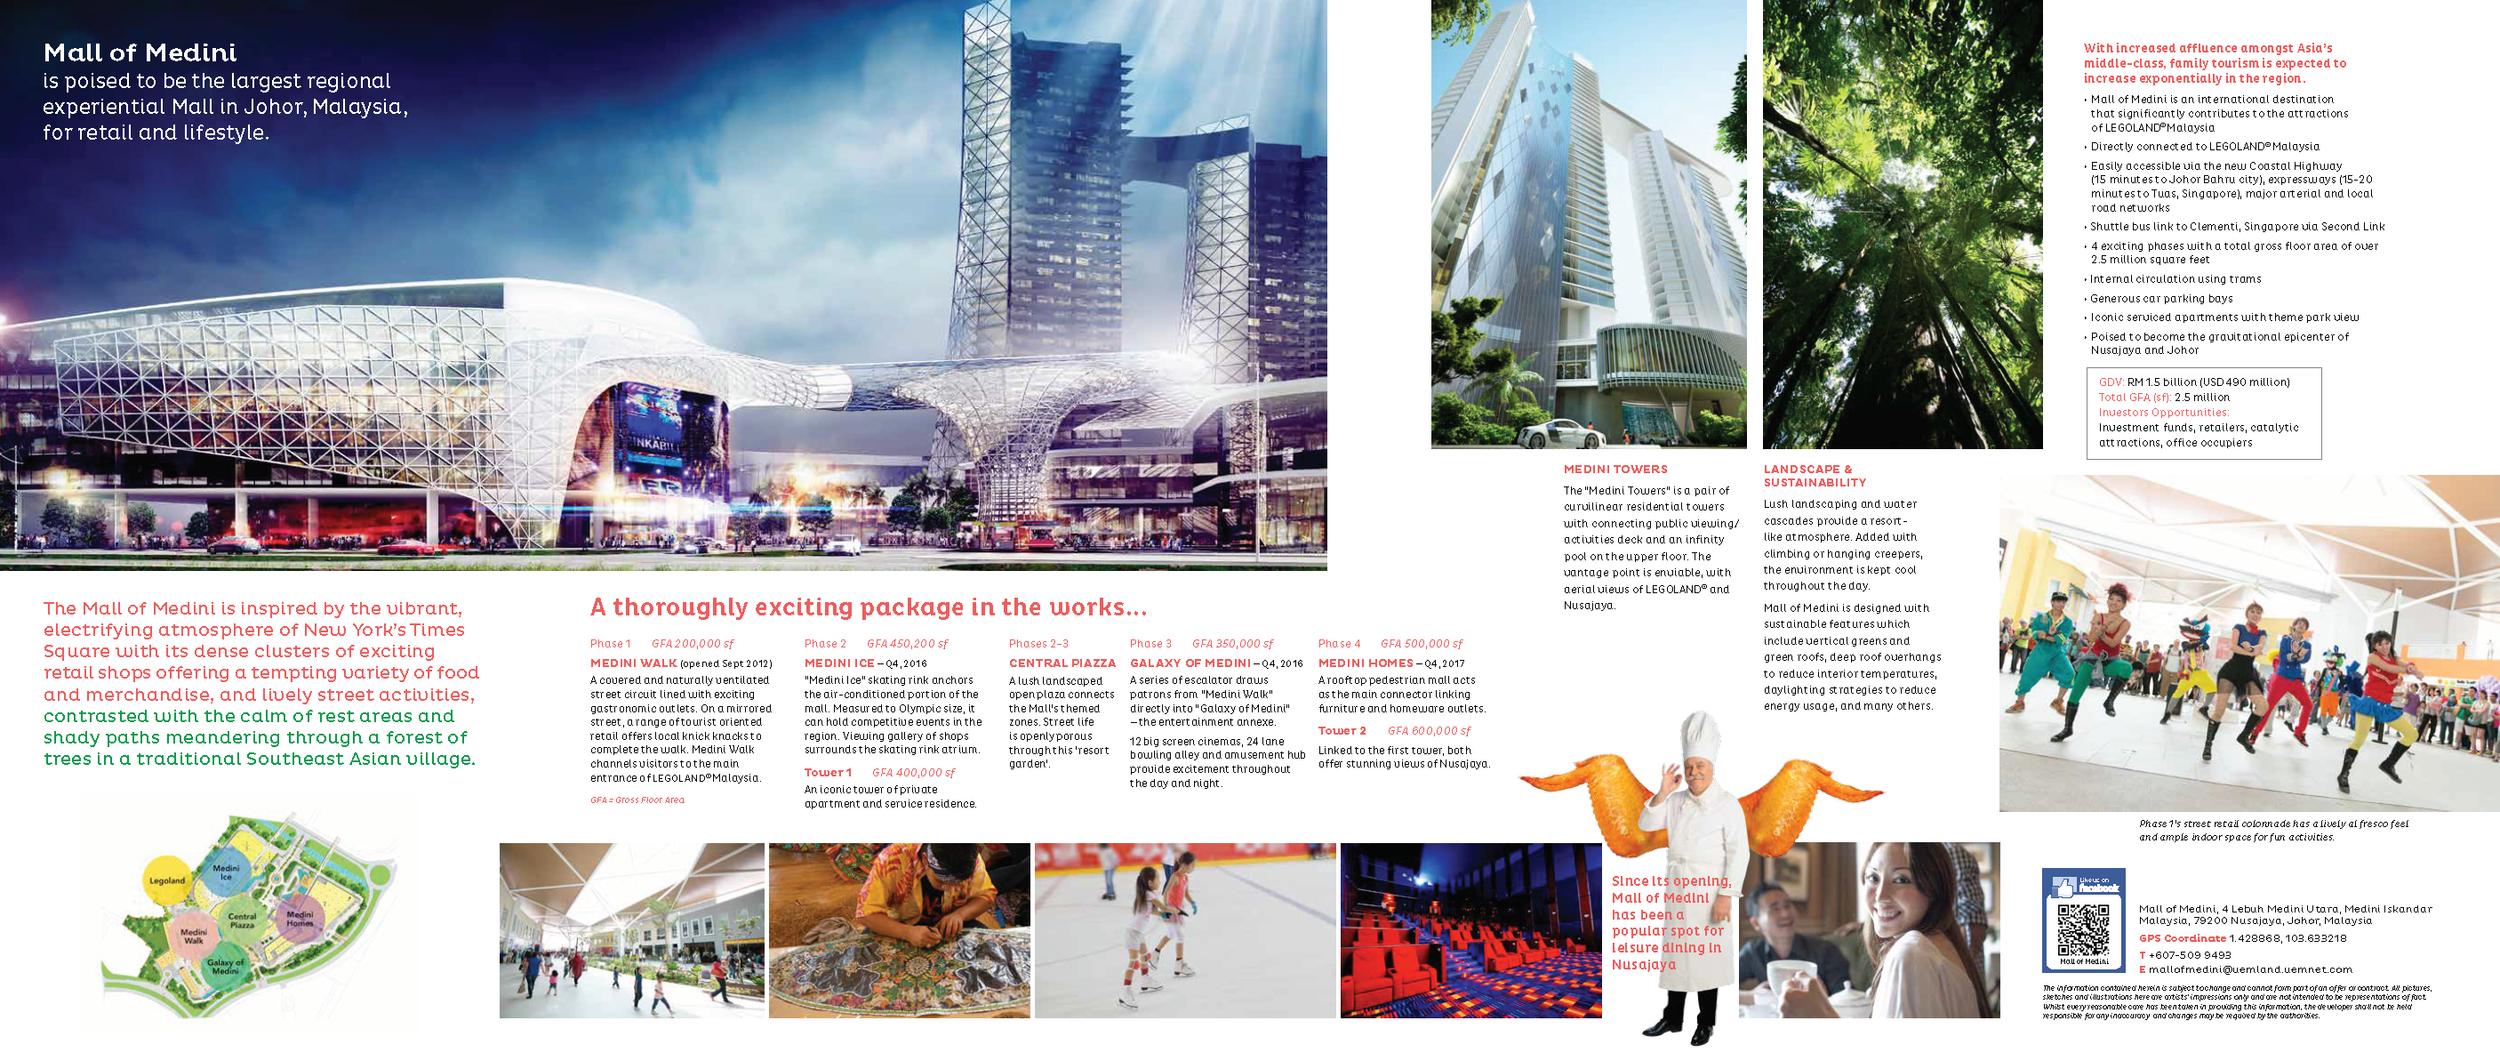 Mall of Medini promotional leaflet.